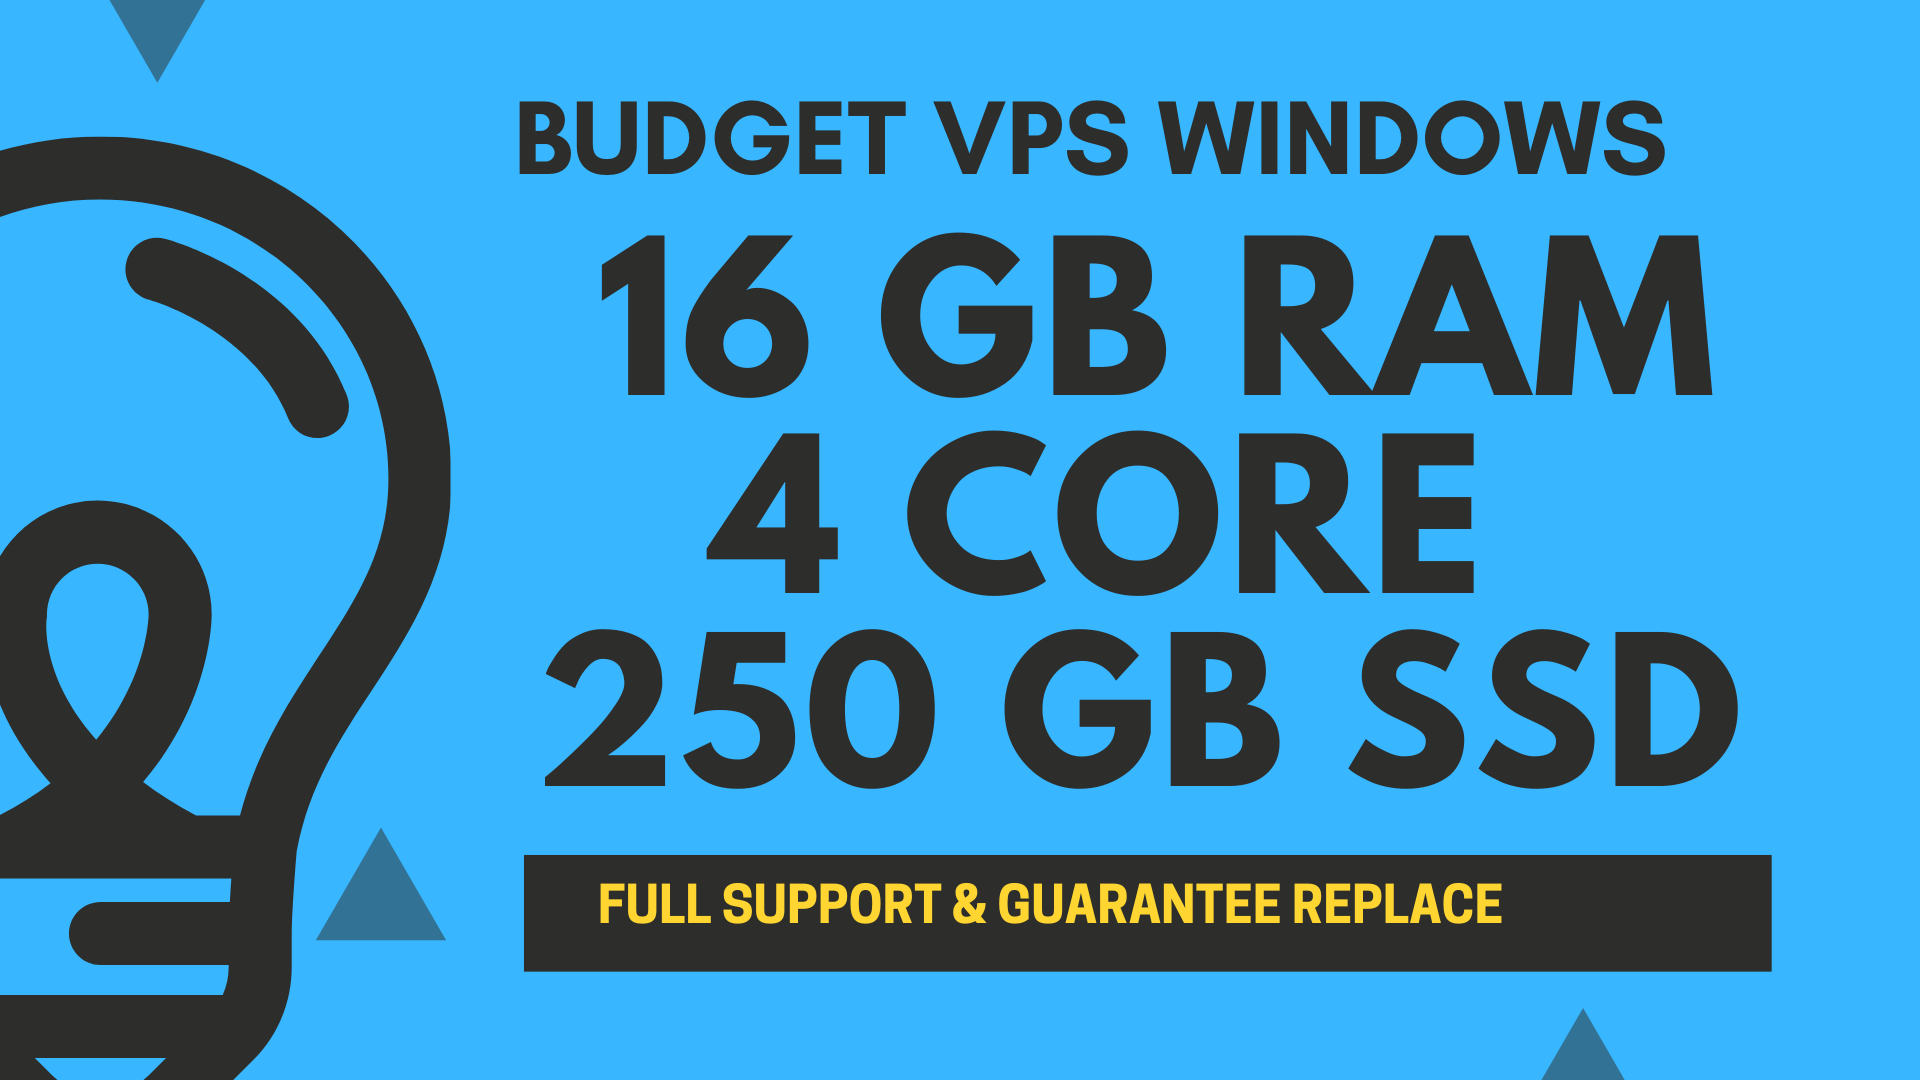 BUDGET Windows VPS RDP 16GB RAM 4CORE 250GB SSD